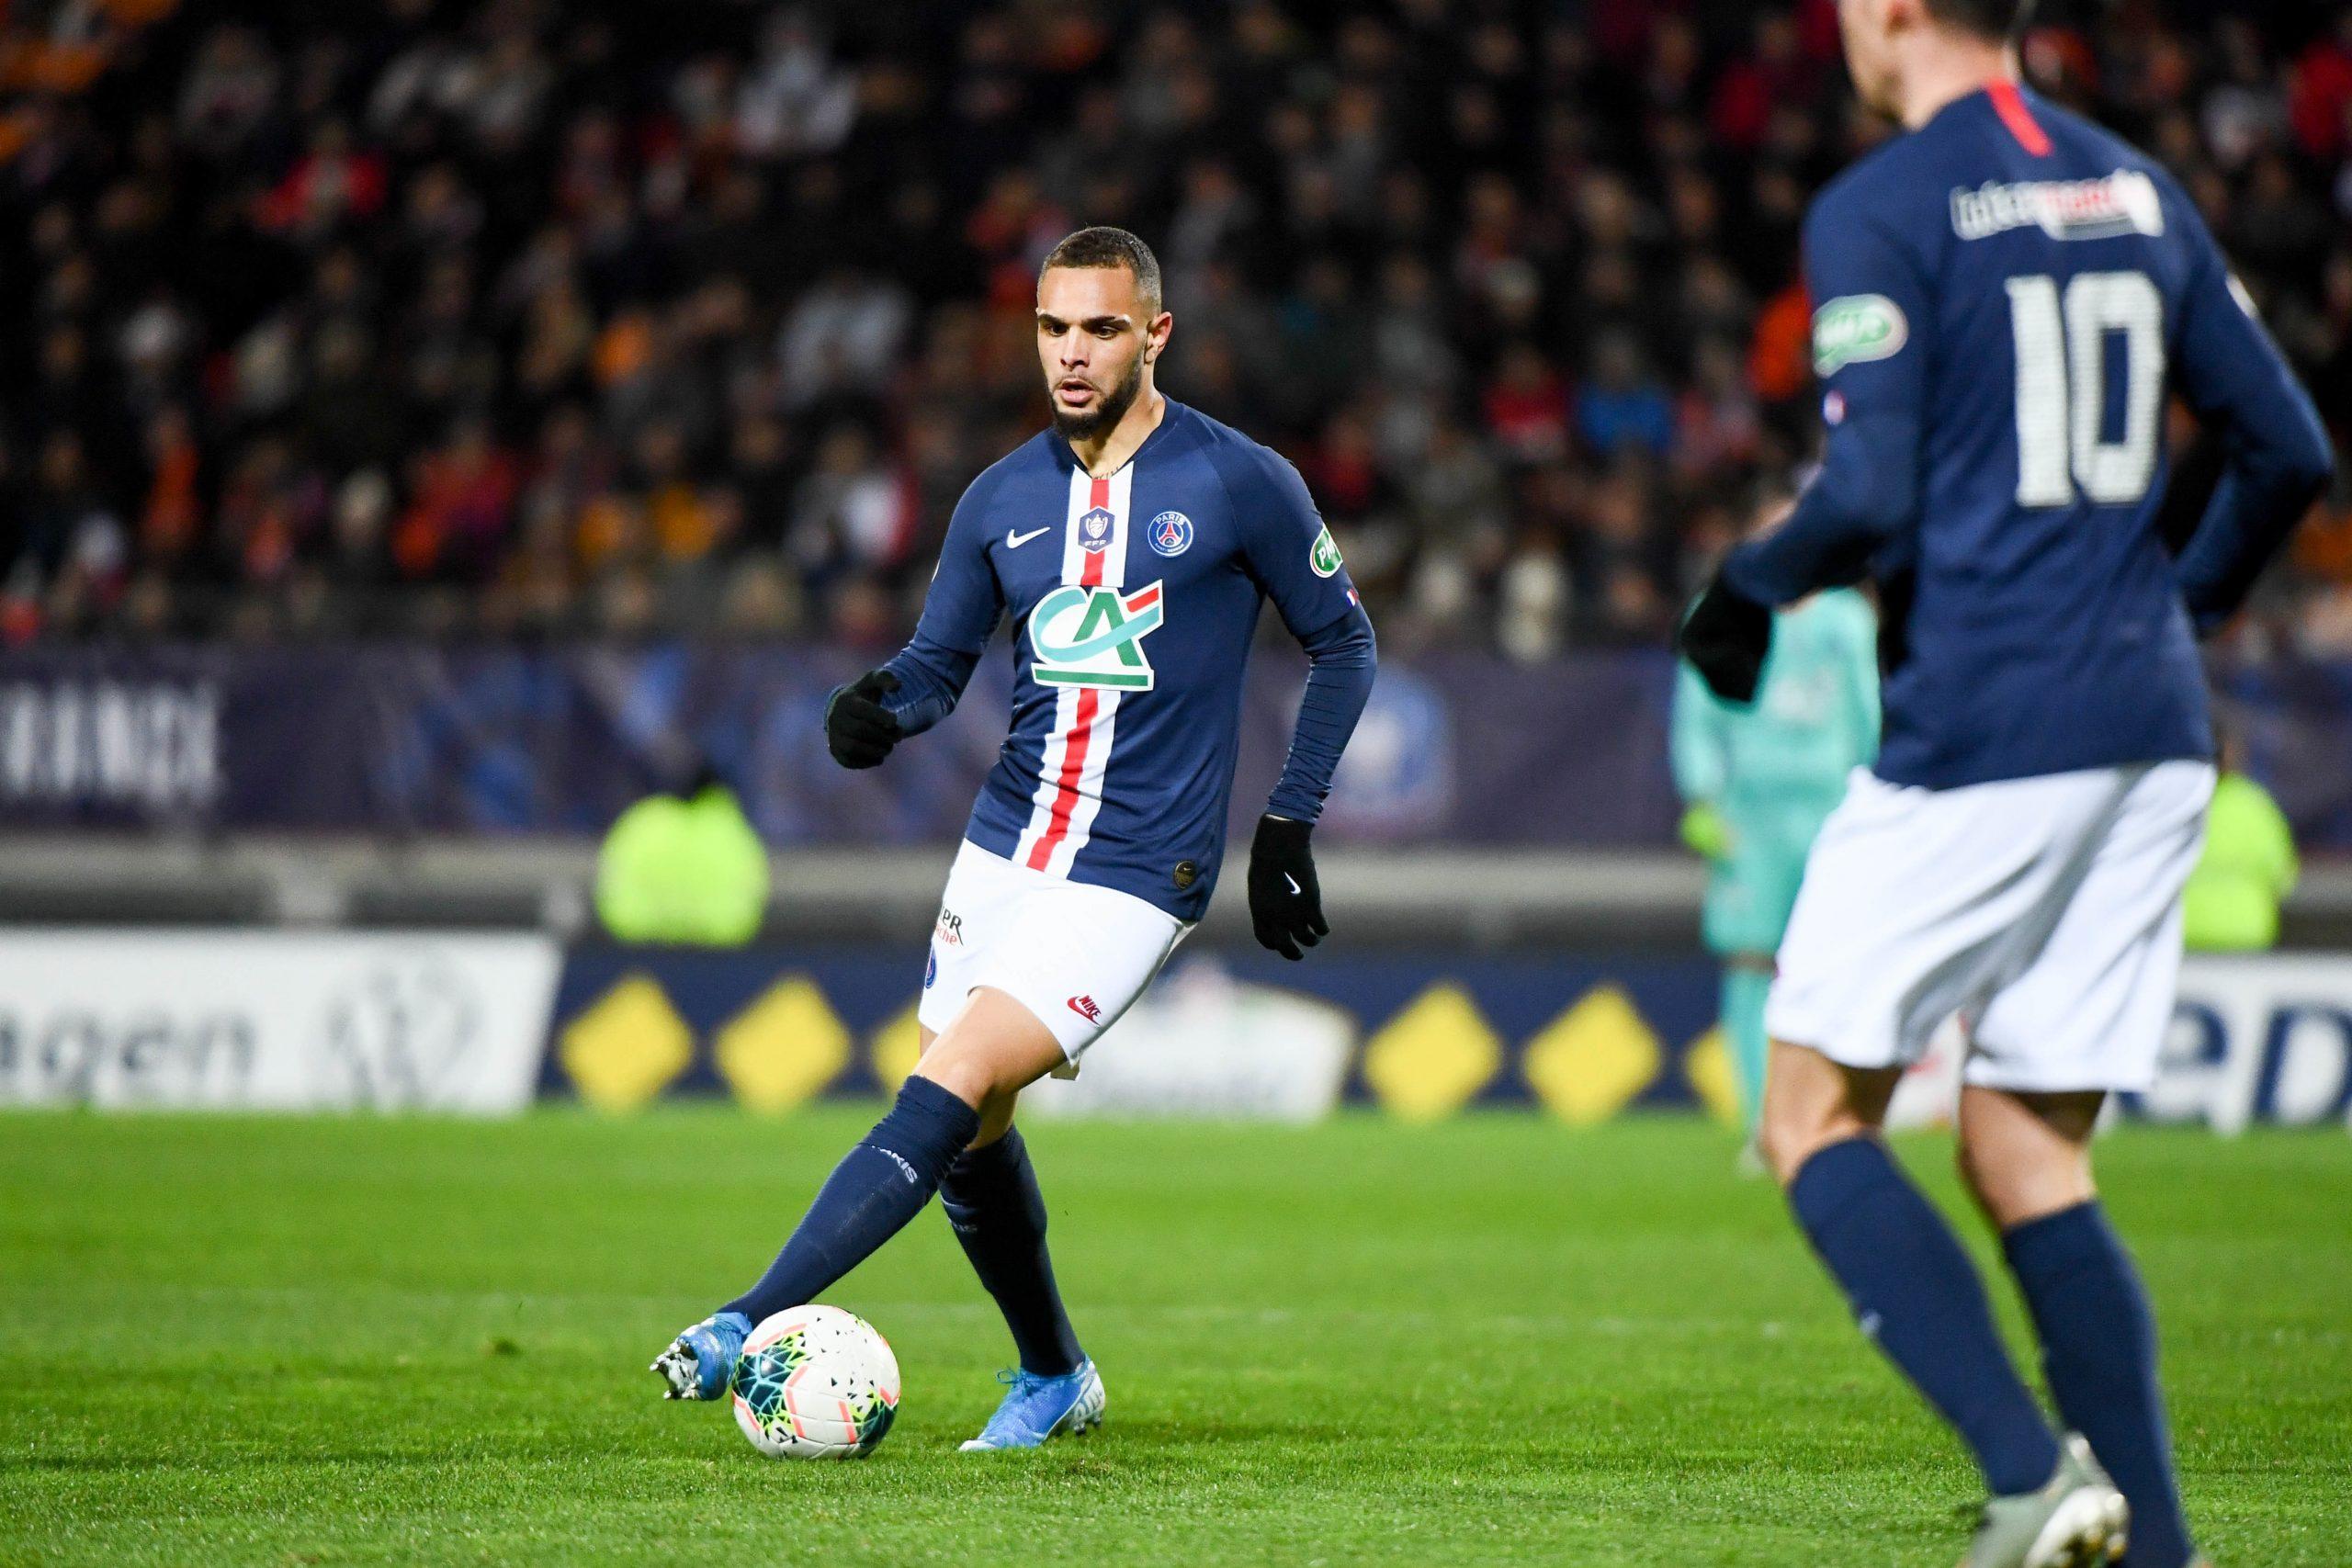 Mercato - L'échange entre De Sciglio et Kurzawa «a capoté», selon Eurosport